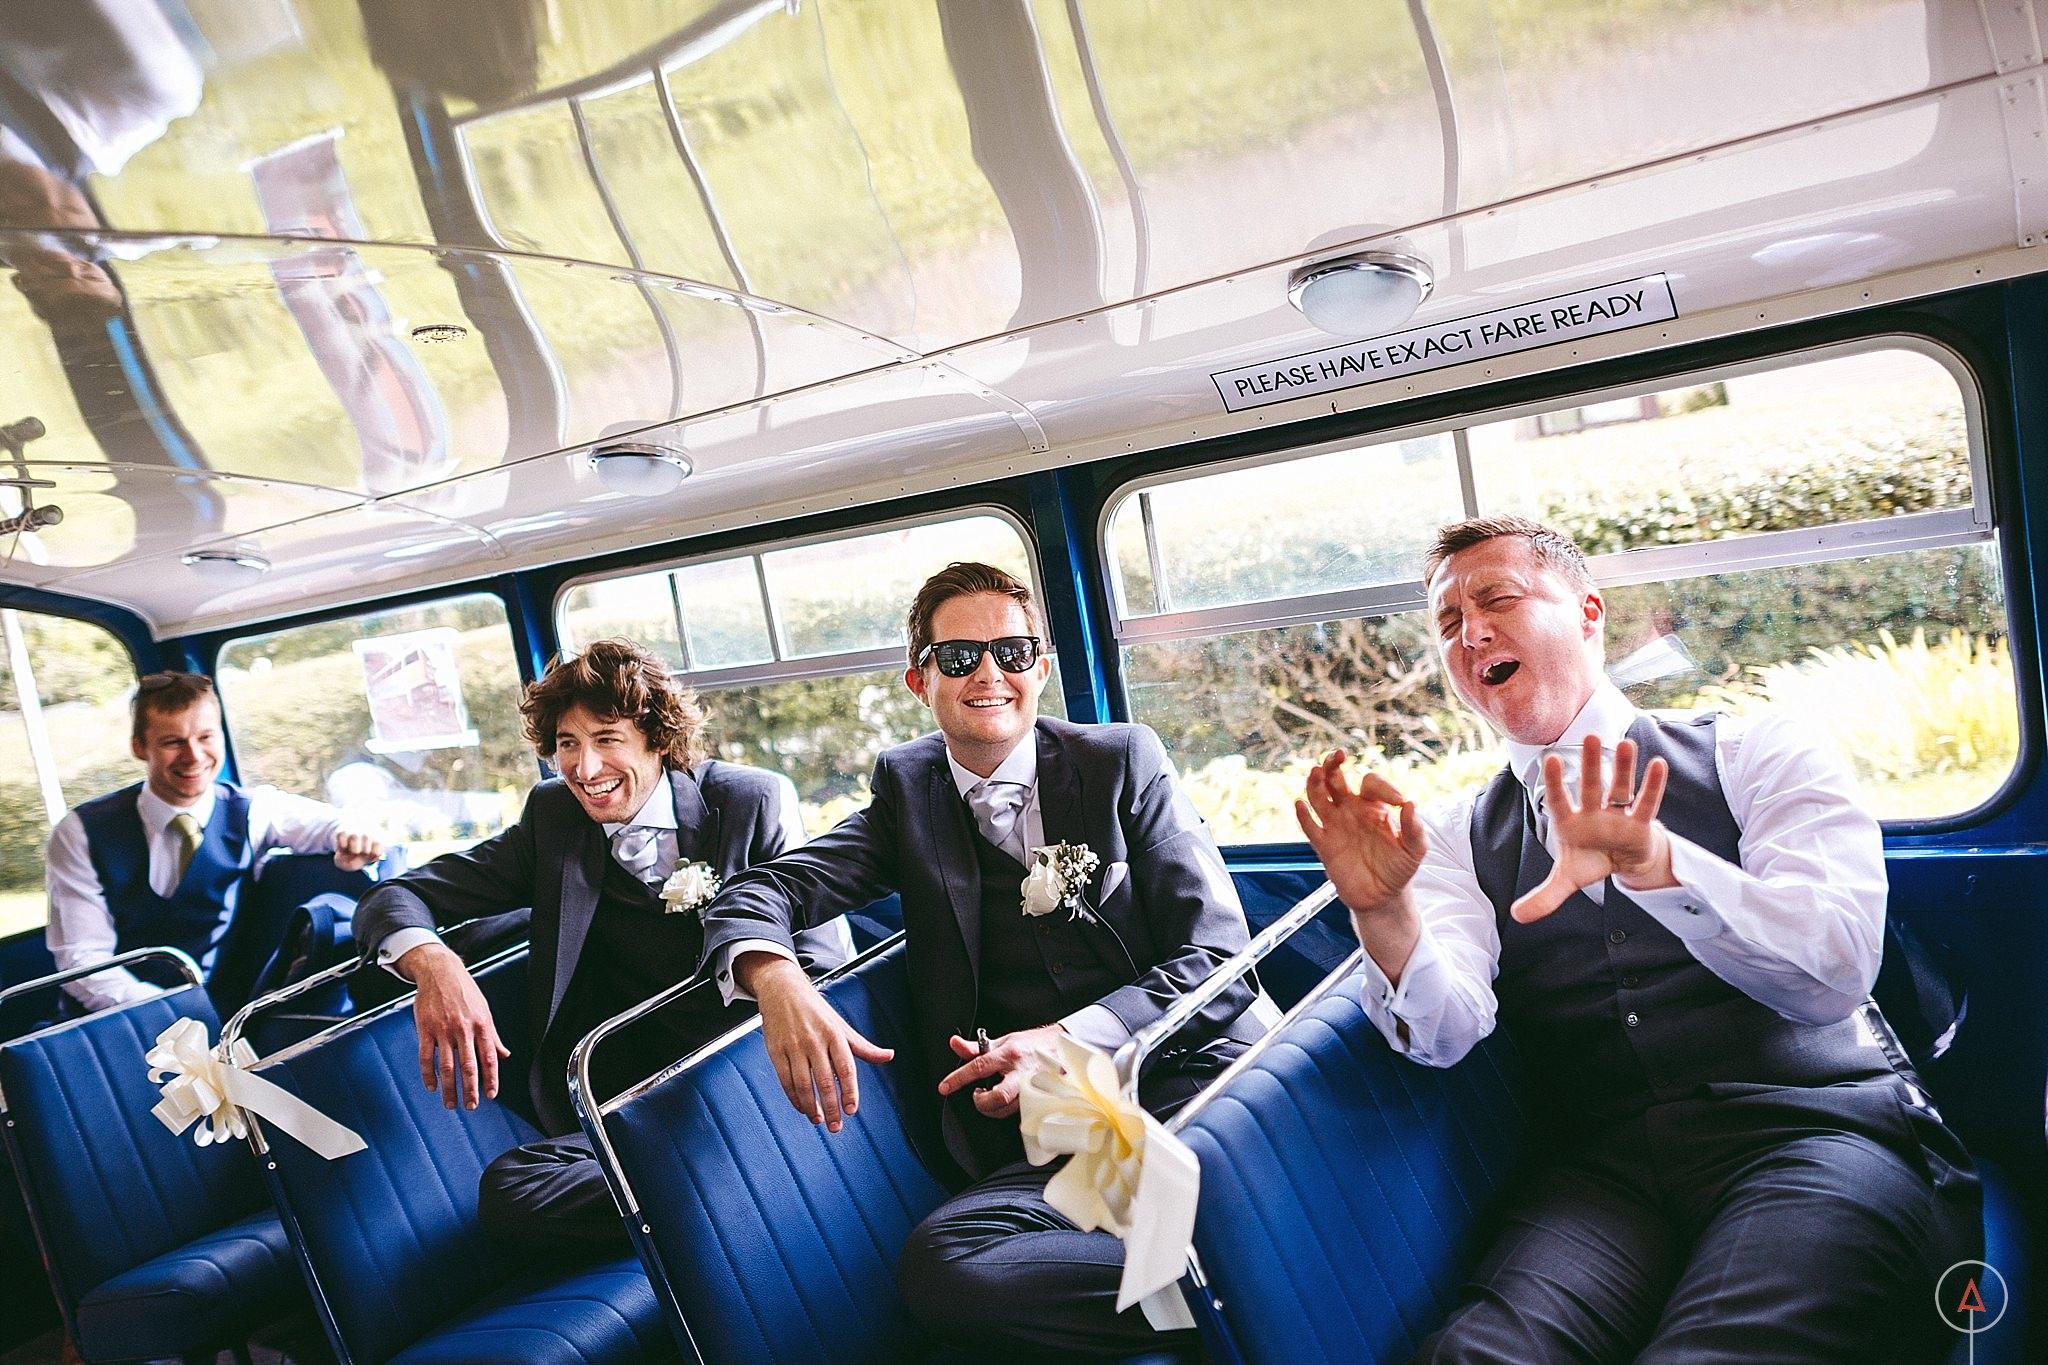 cardiff-wedding-photographer-aga-tomaszek_0379